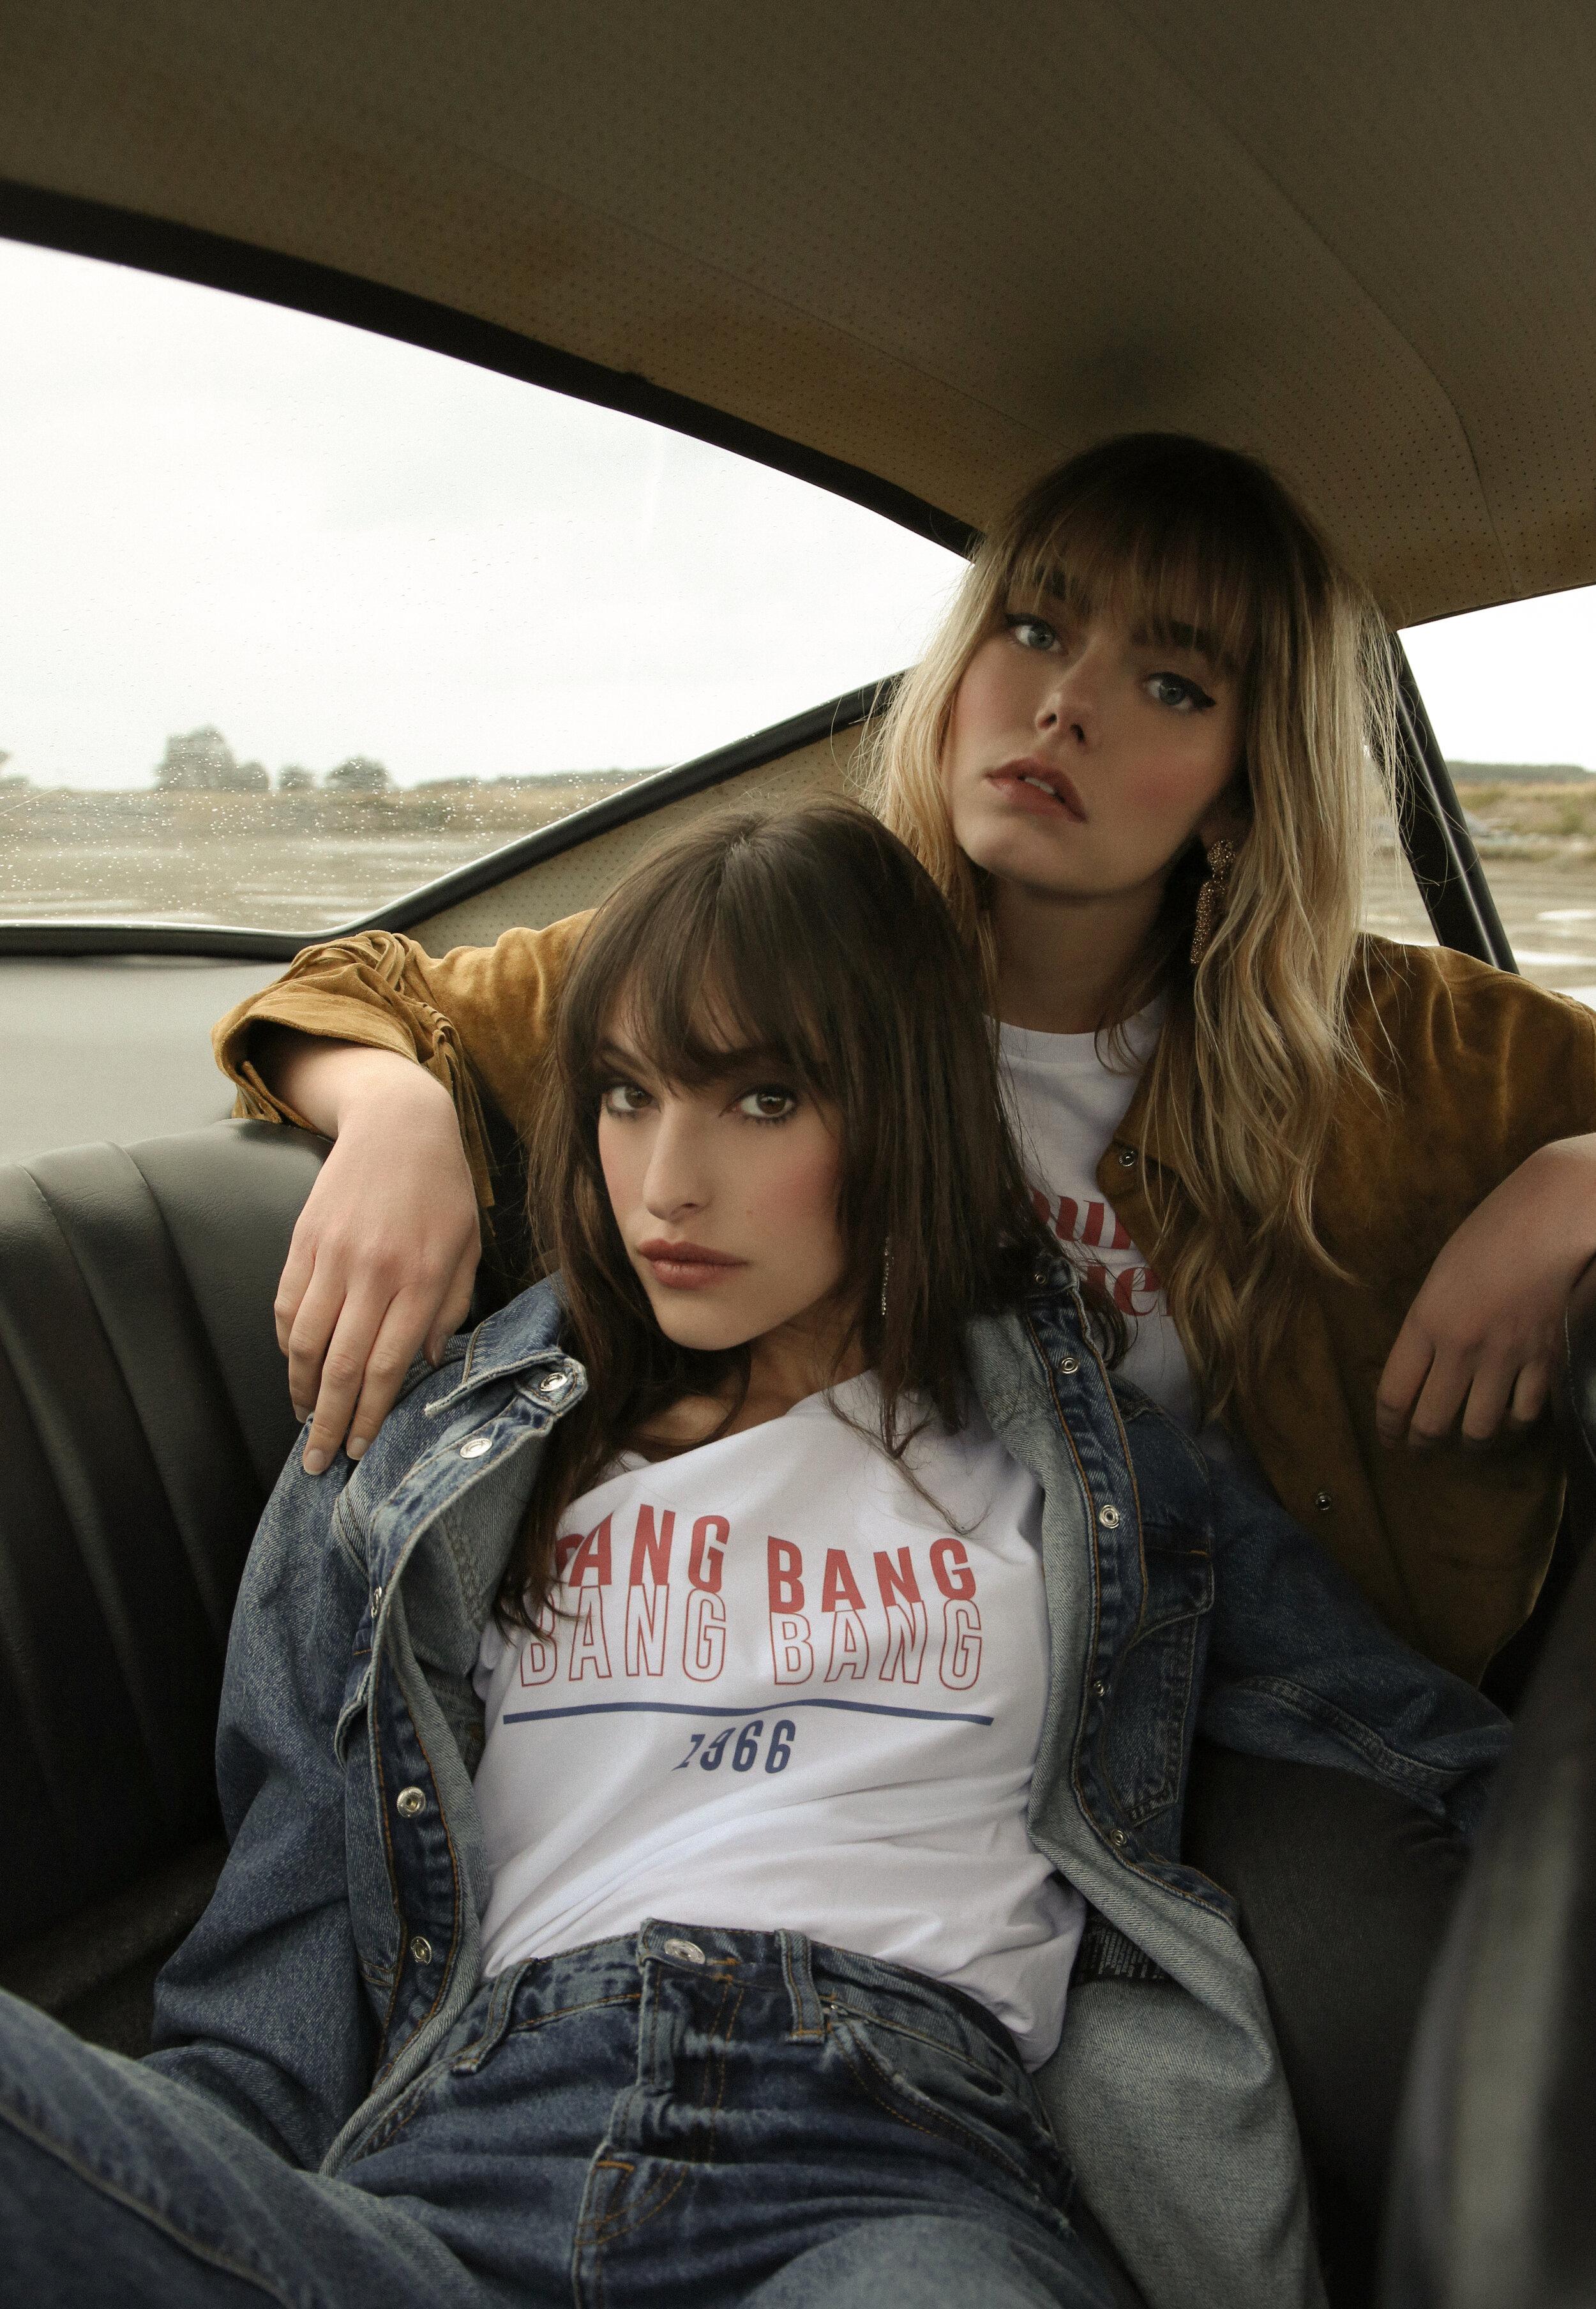 Copie de Amour Singulier - T-shirt Bang Bang